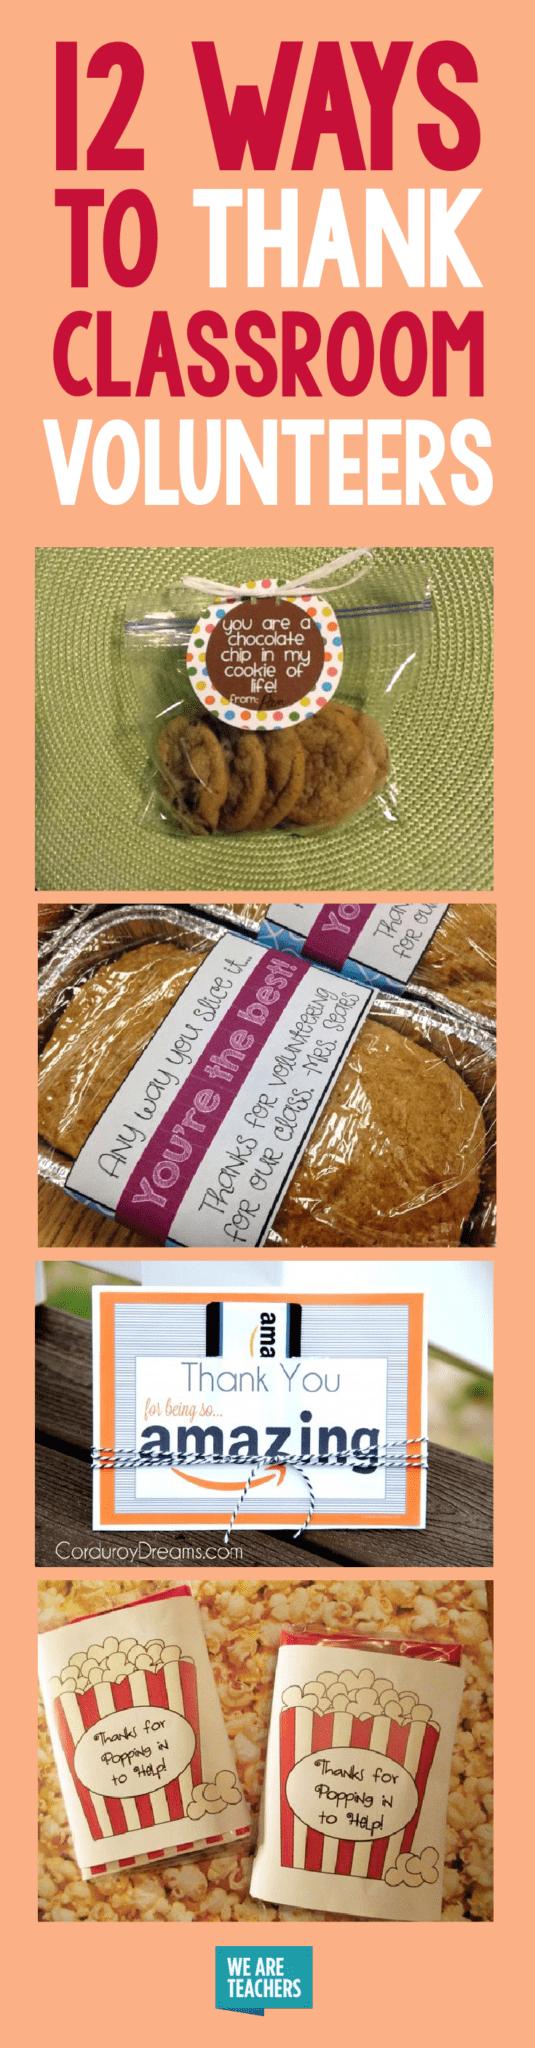 Classroom Volunteer Appreciation Gifts 12 Ways To Thank Volunteers